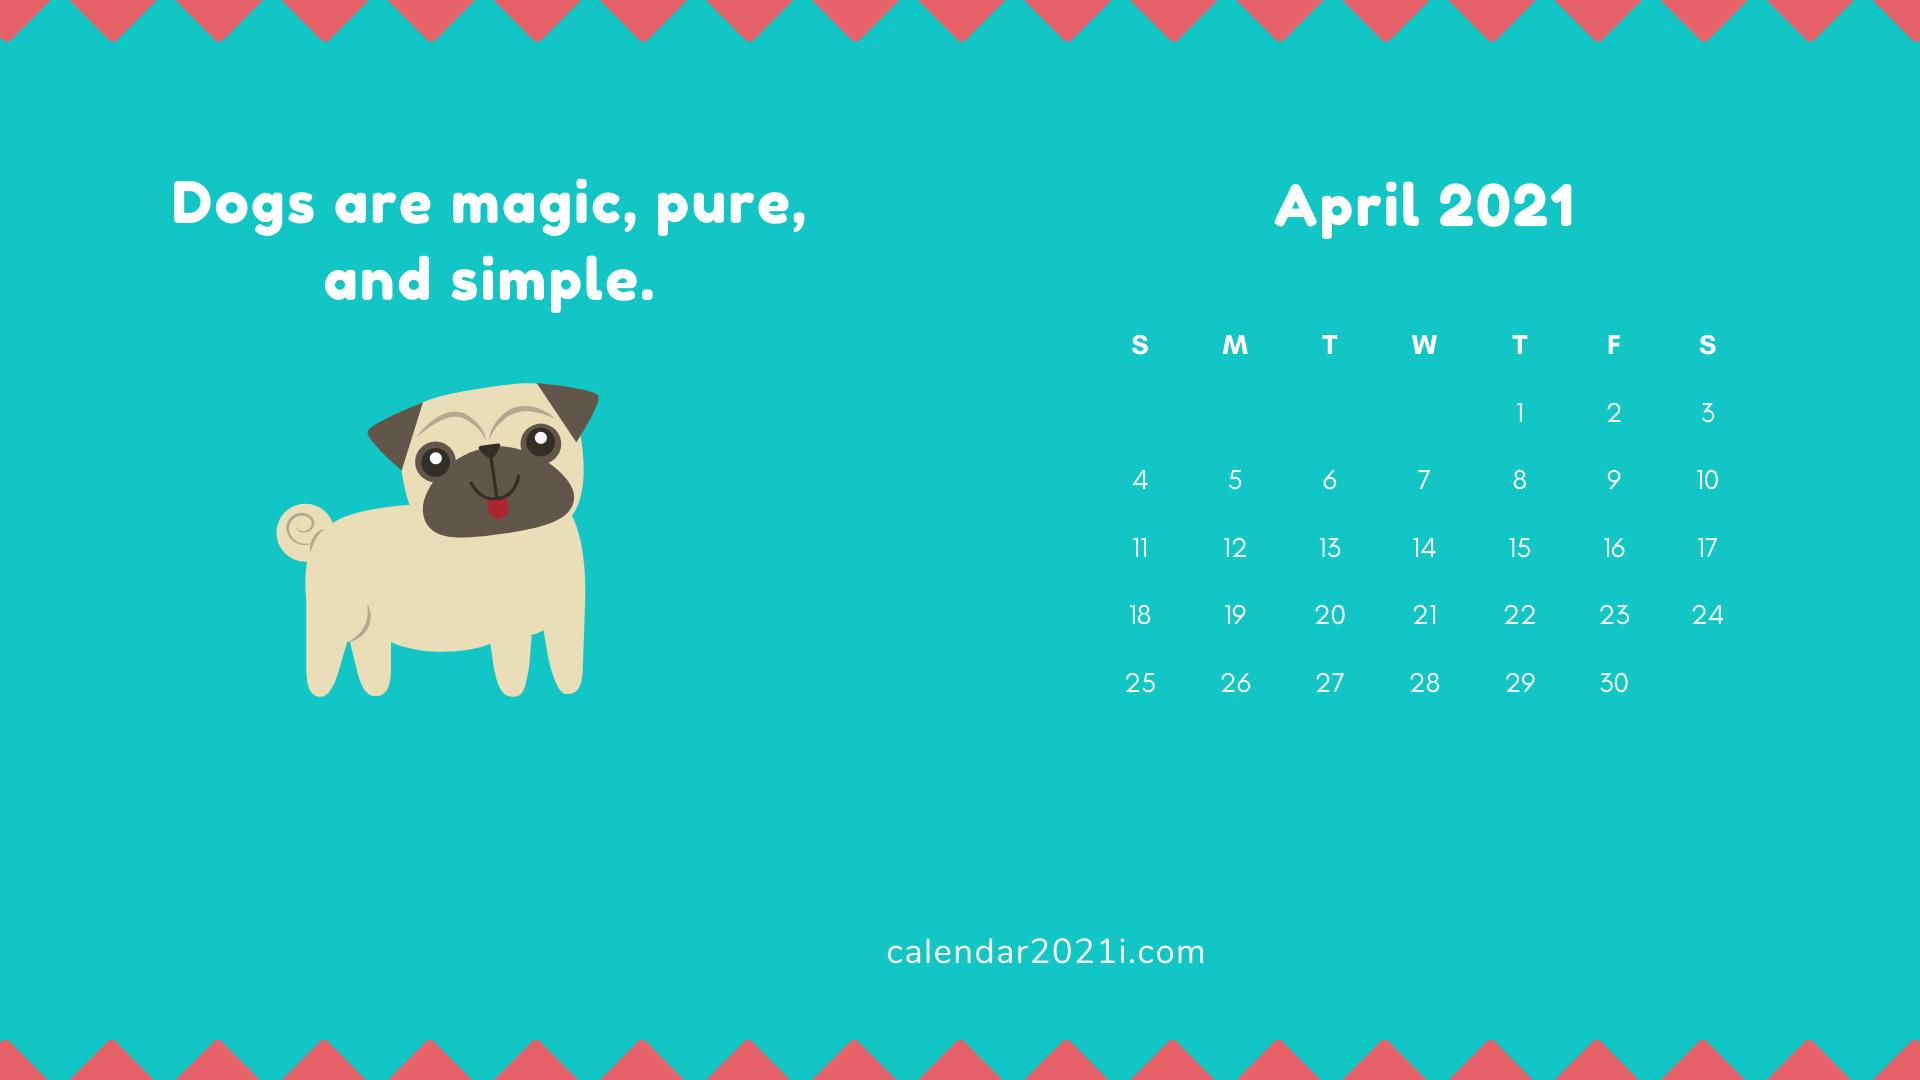 April 2021 Calendar Wallpaper Calendar wallpaper 2021 calendar 1920x1080